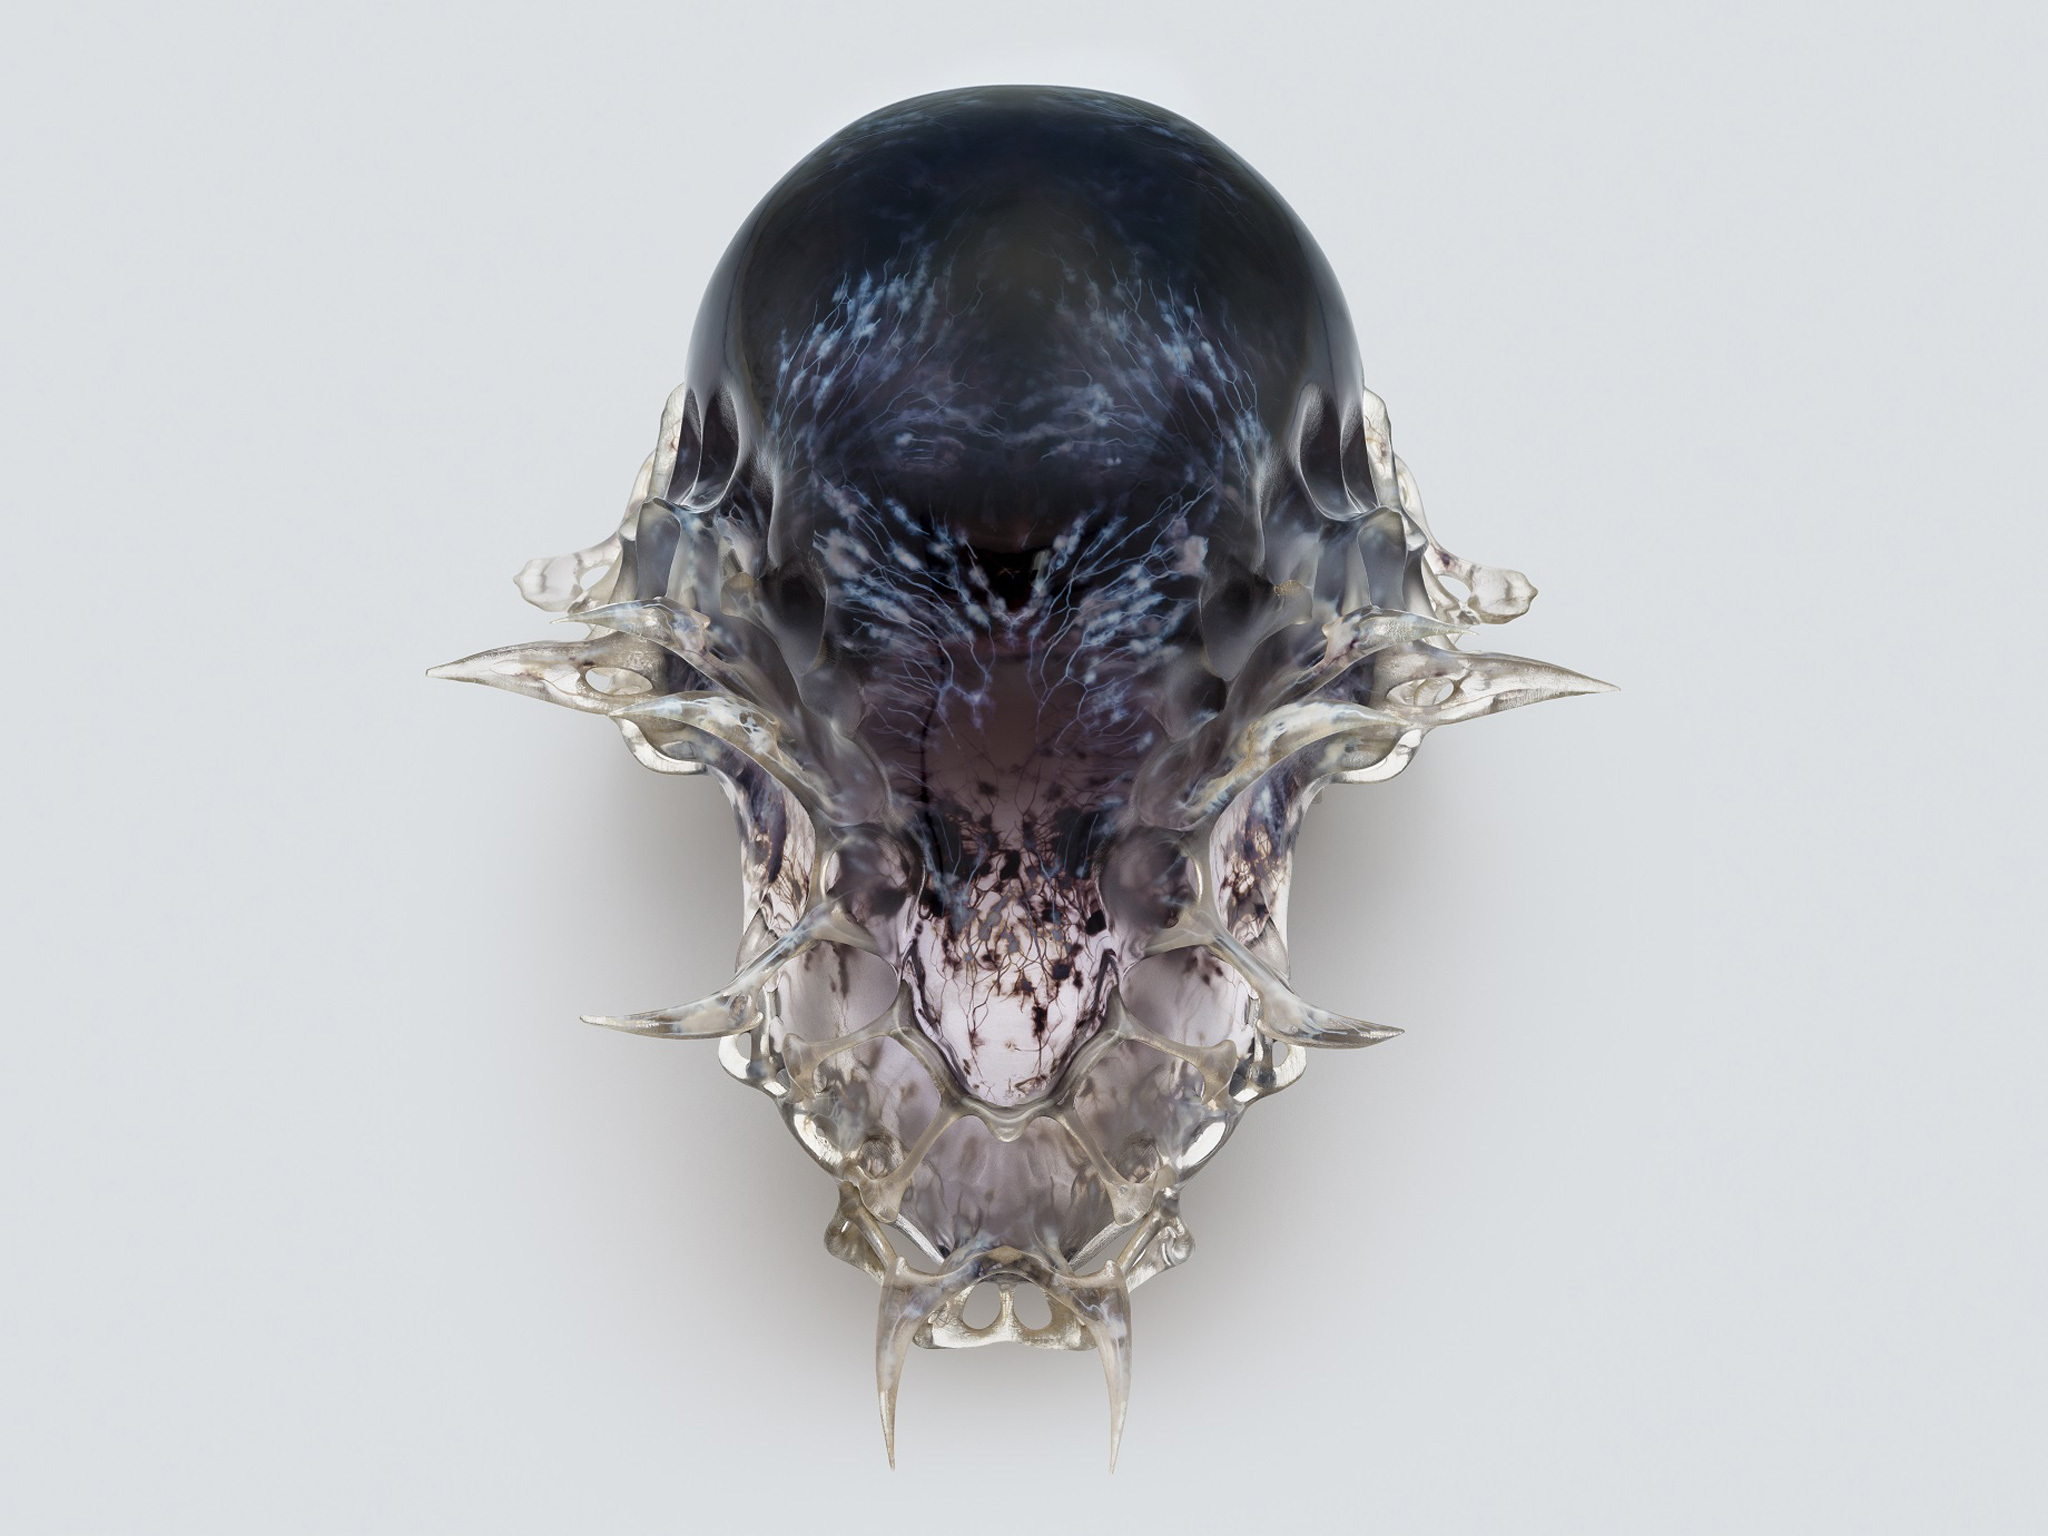 Neri Oxman - Björk death mask - Design Museum